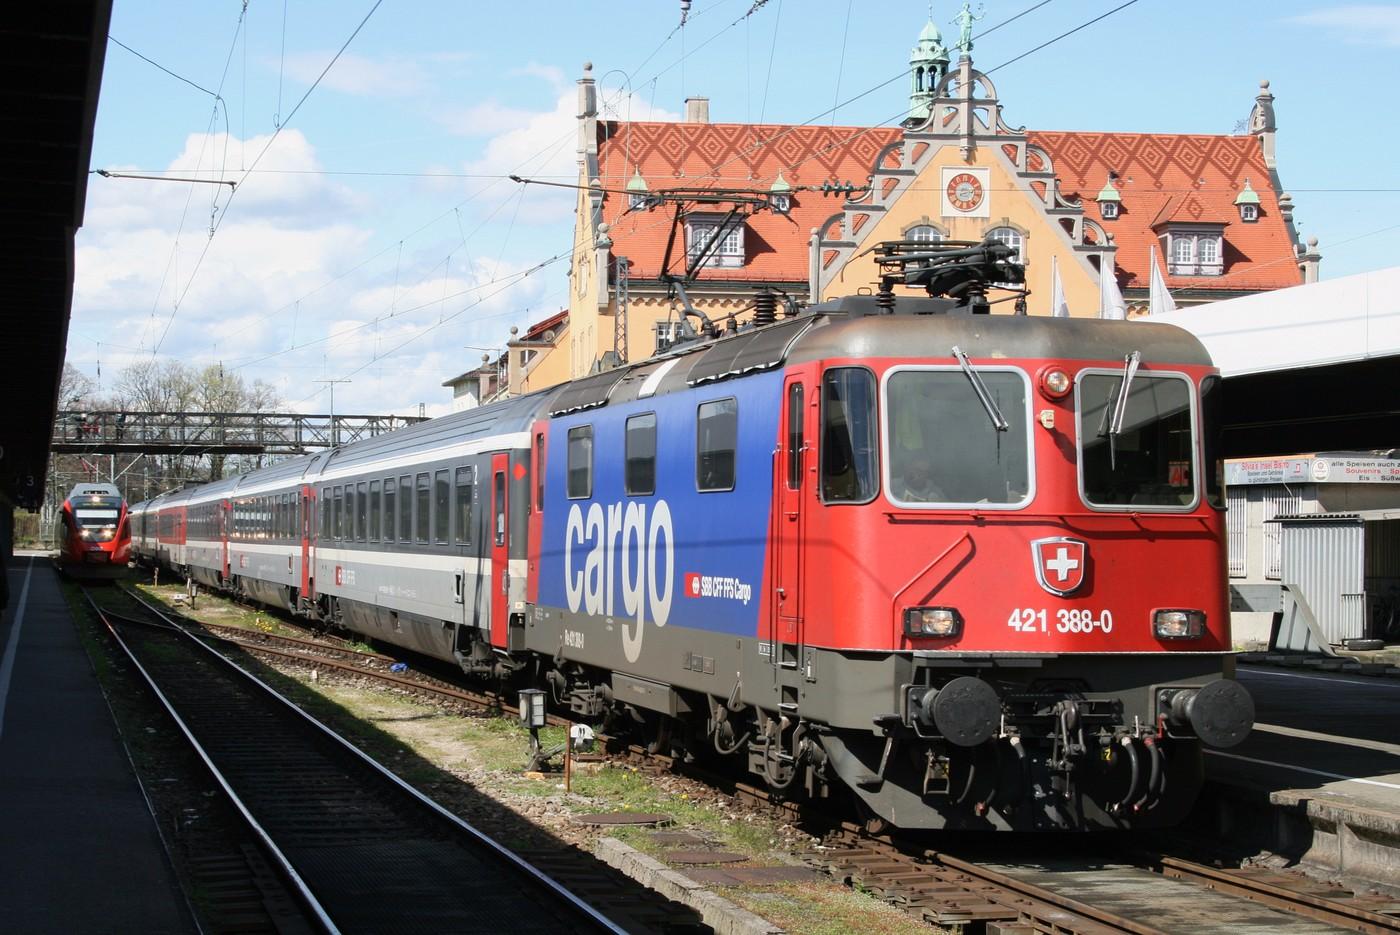 http://www.eisenbahn-im-bild.de/Temp/C_08_Lind_IMG_3998.jpg